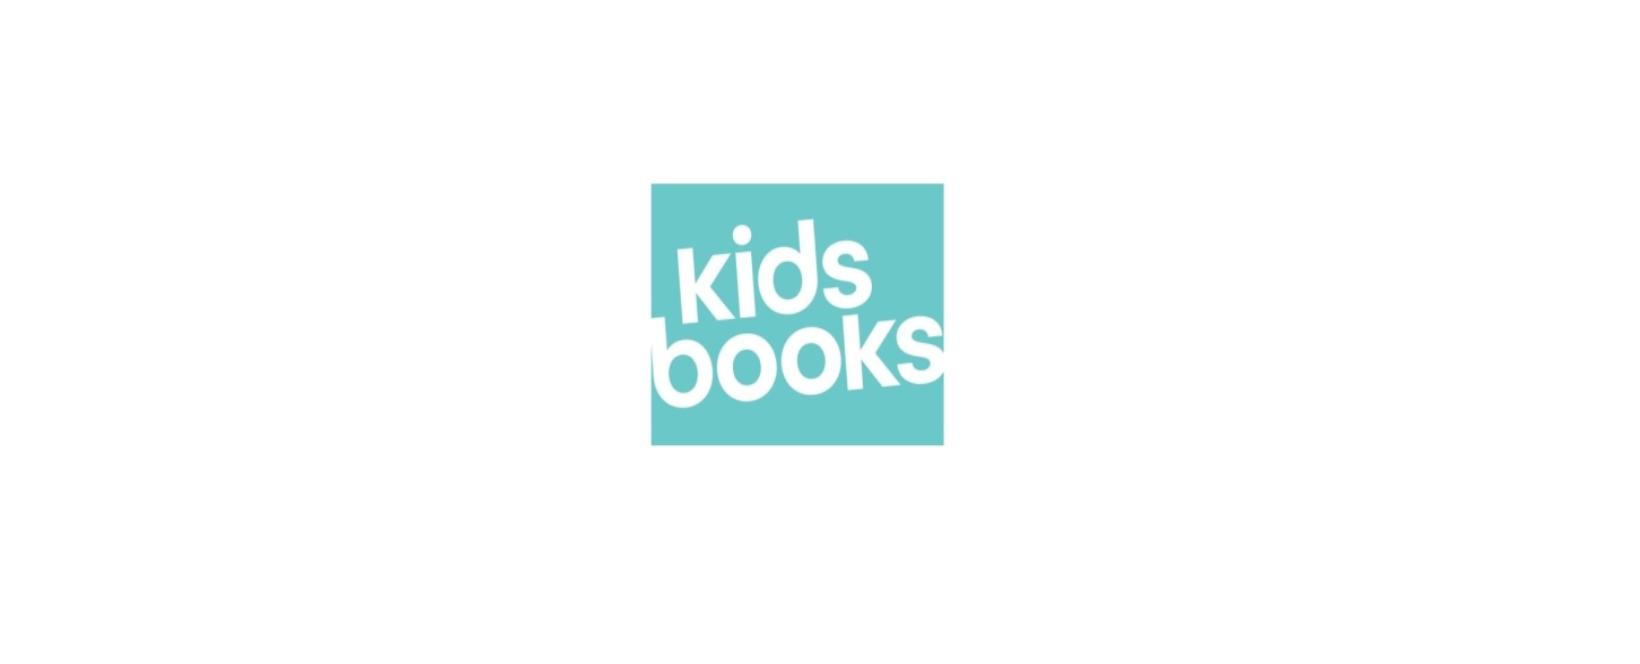 Kidsbooks.com Discount Code 2021